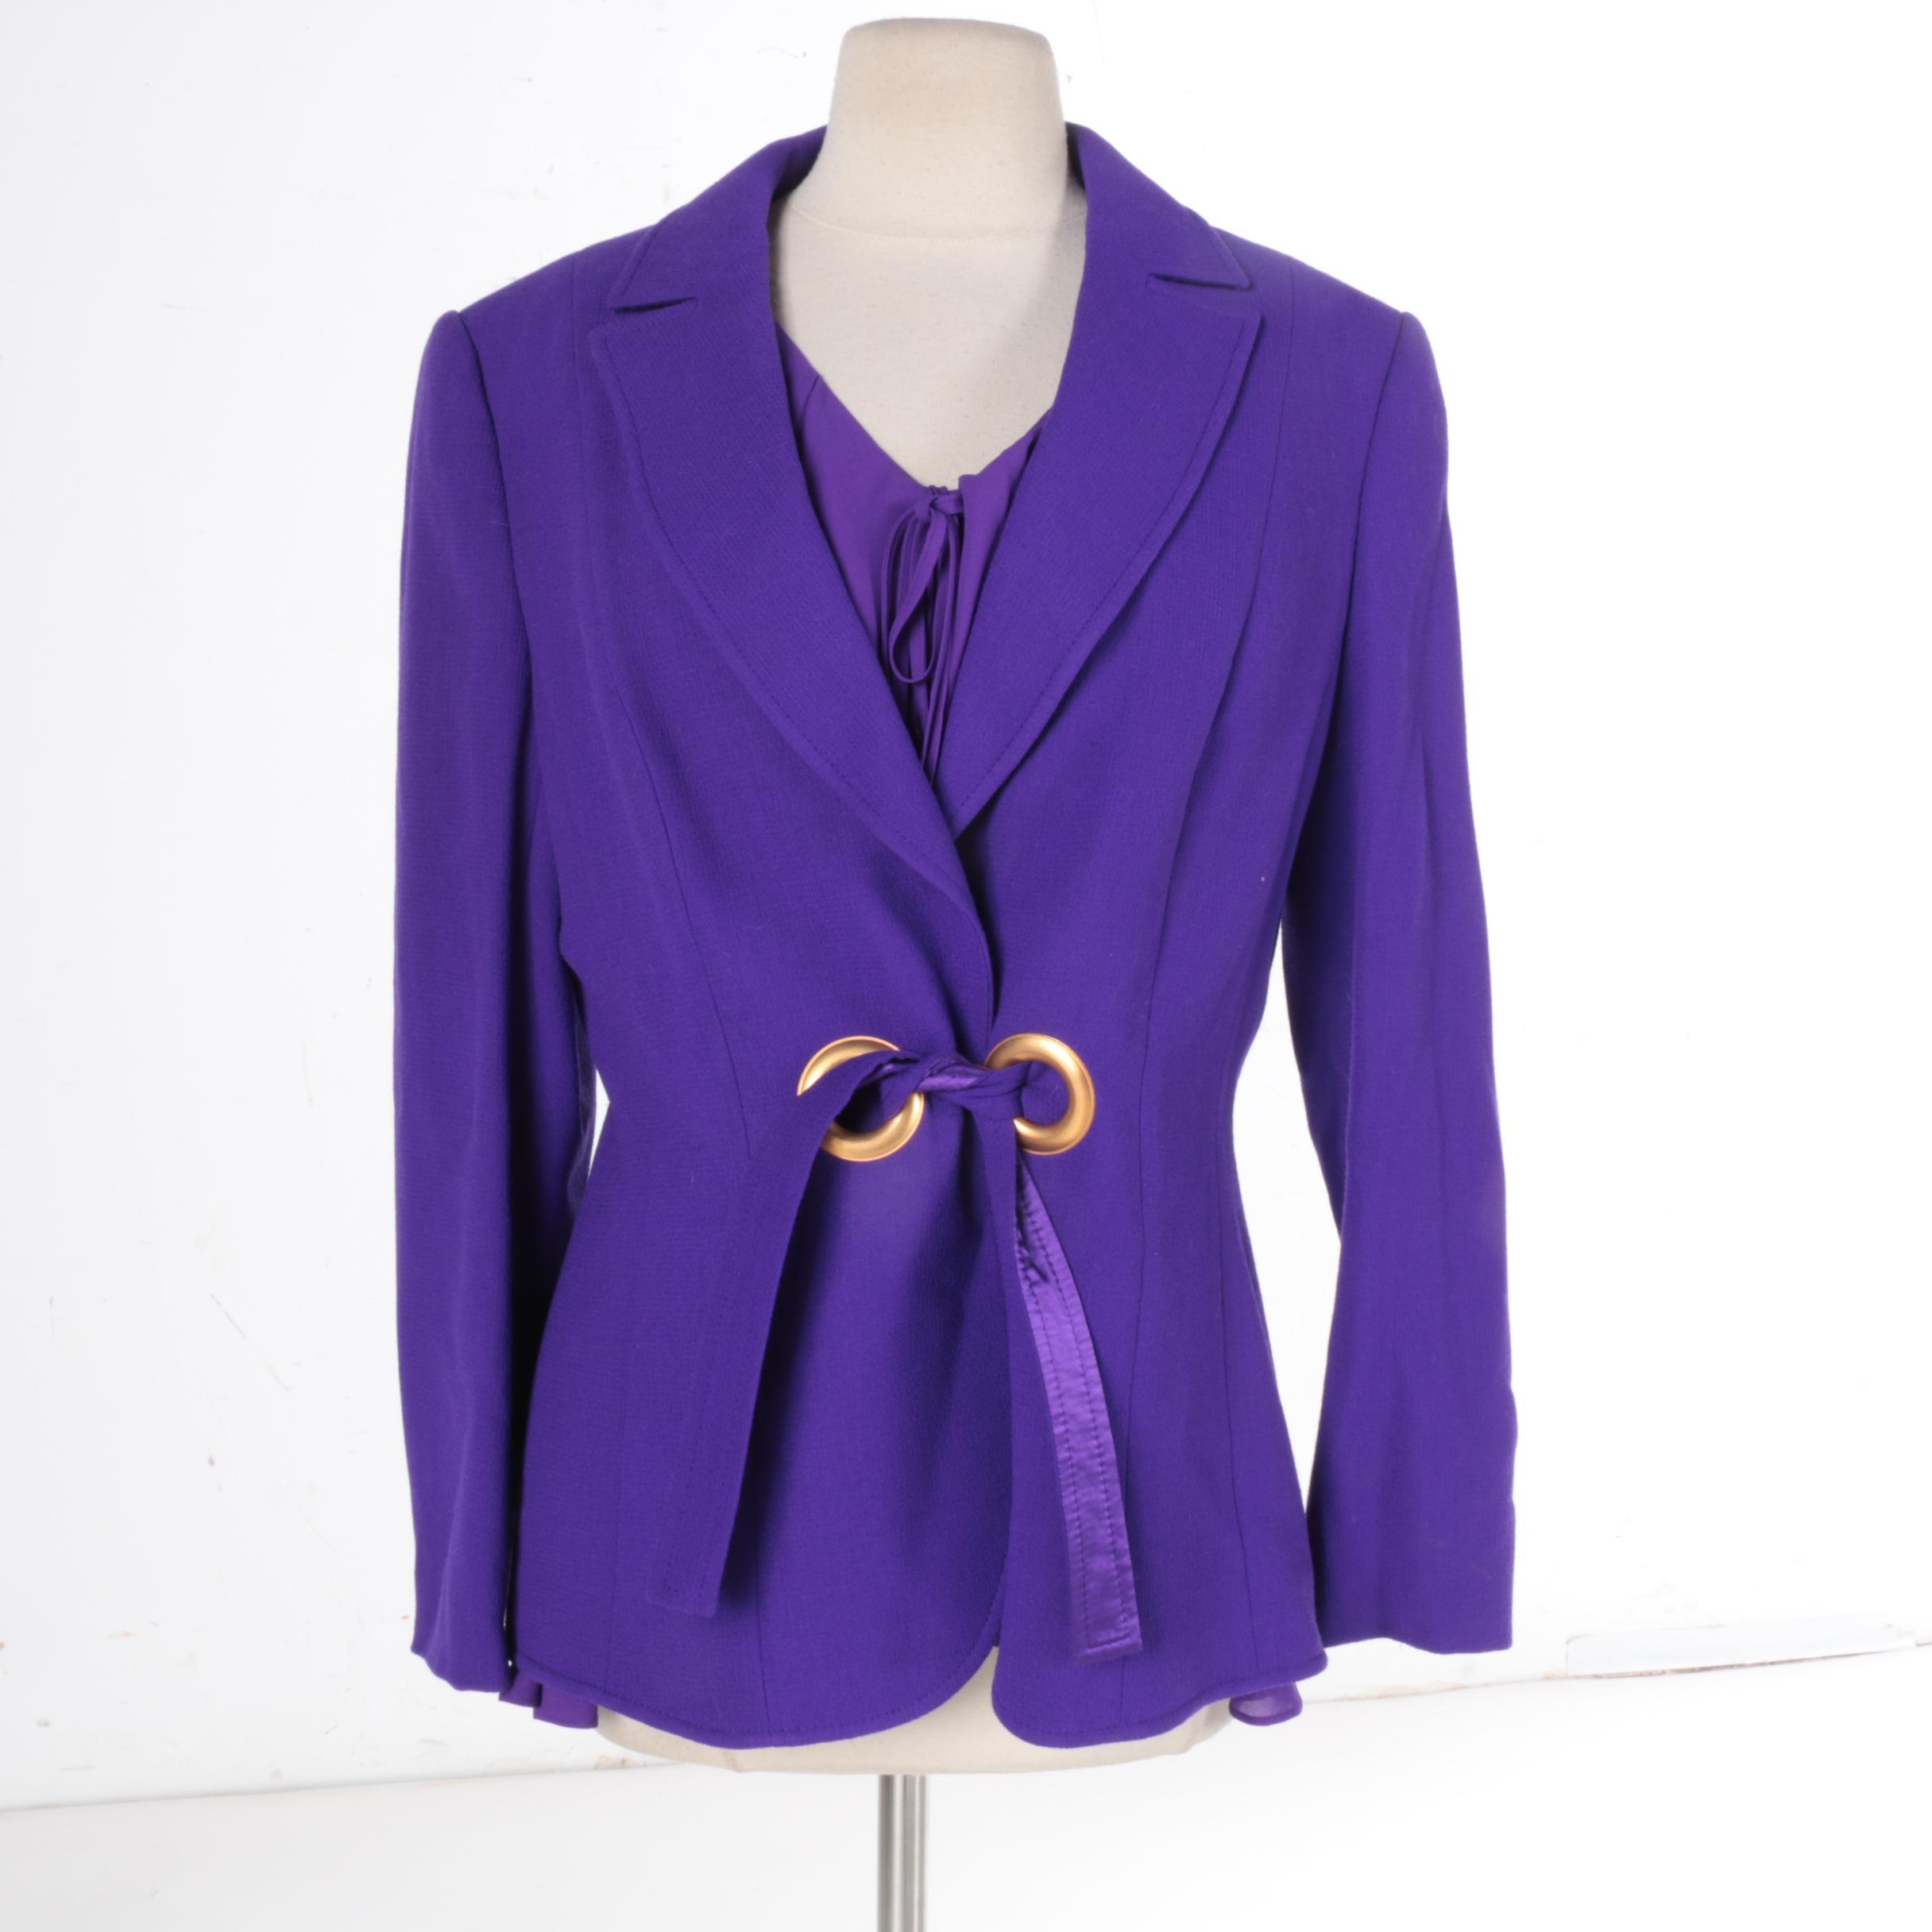 Escada Wool Jacket and Silk Blouse